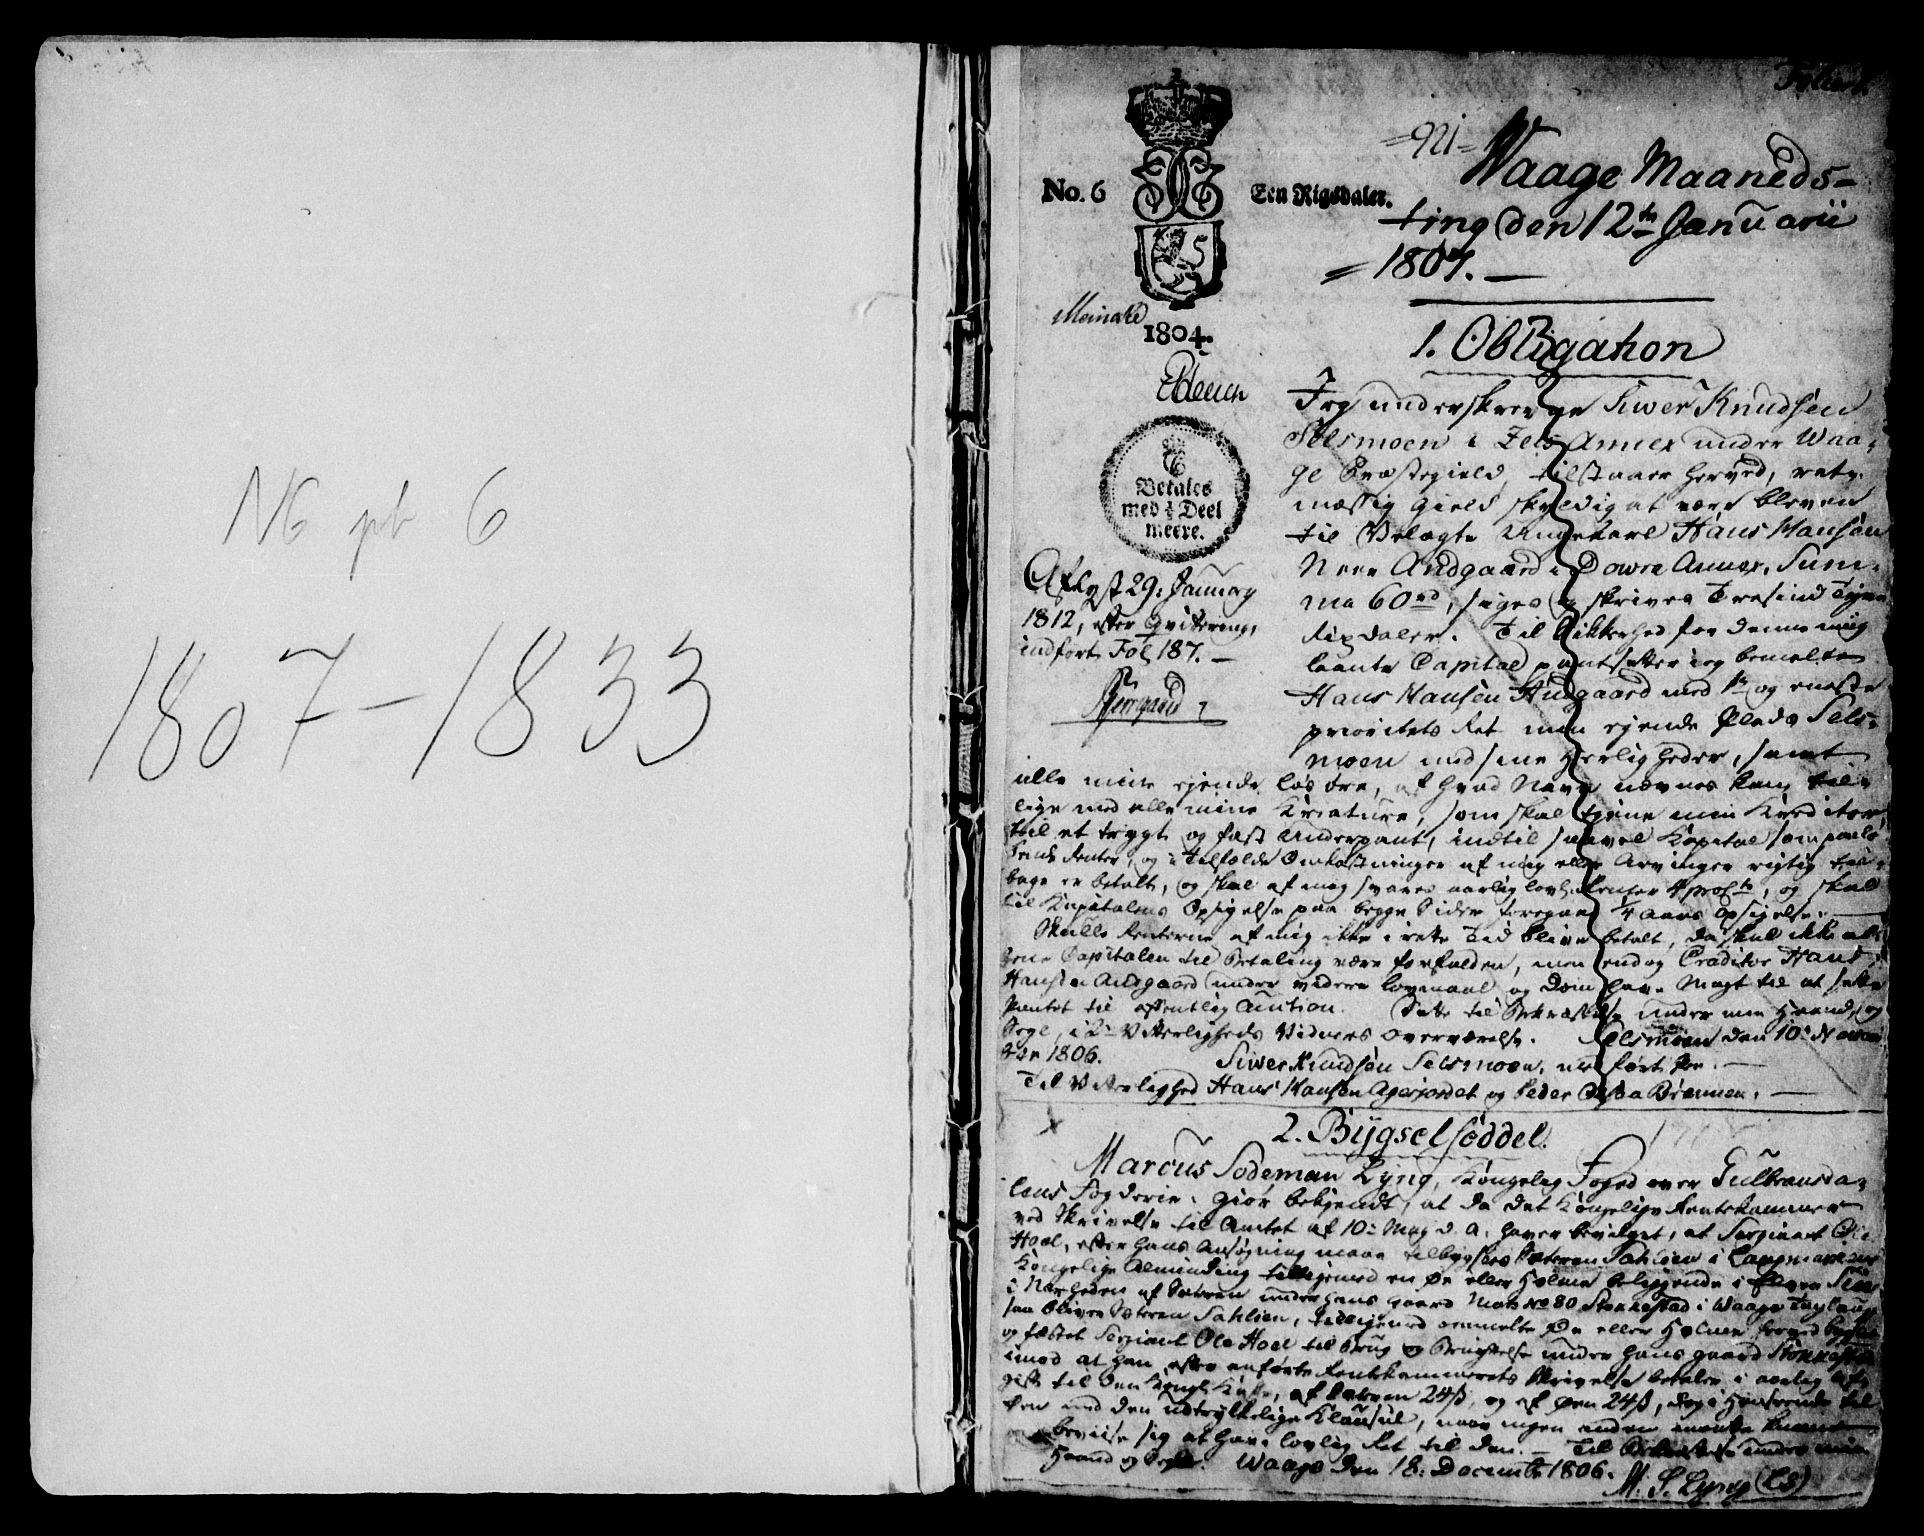 SAH, Nord-Gudbrandsdal tingrett, H/Hb/Hba/L0005: Pantebok nr. 5, 1807-1833, s. 1